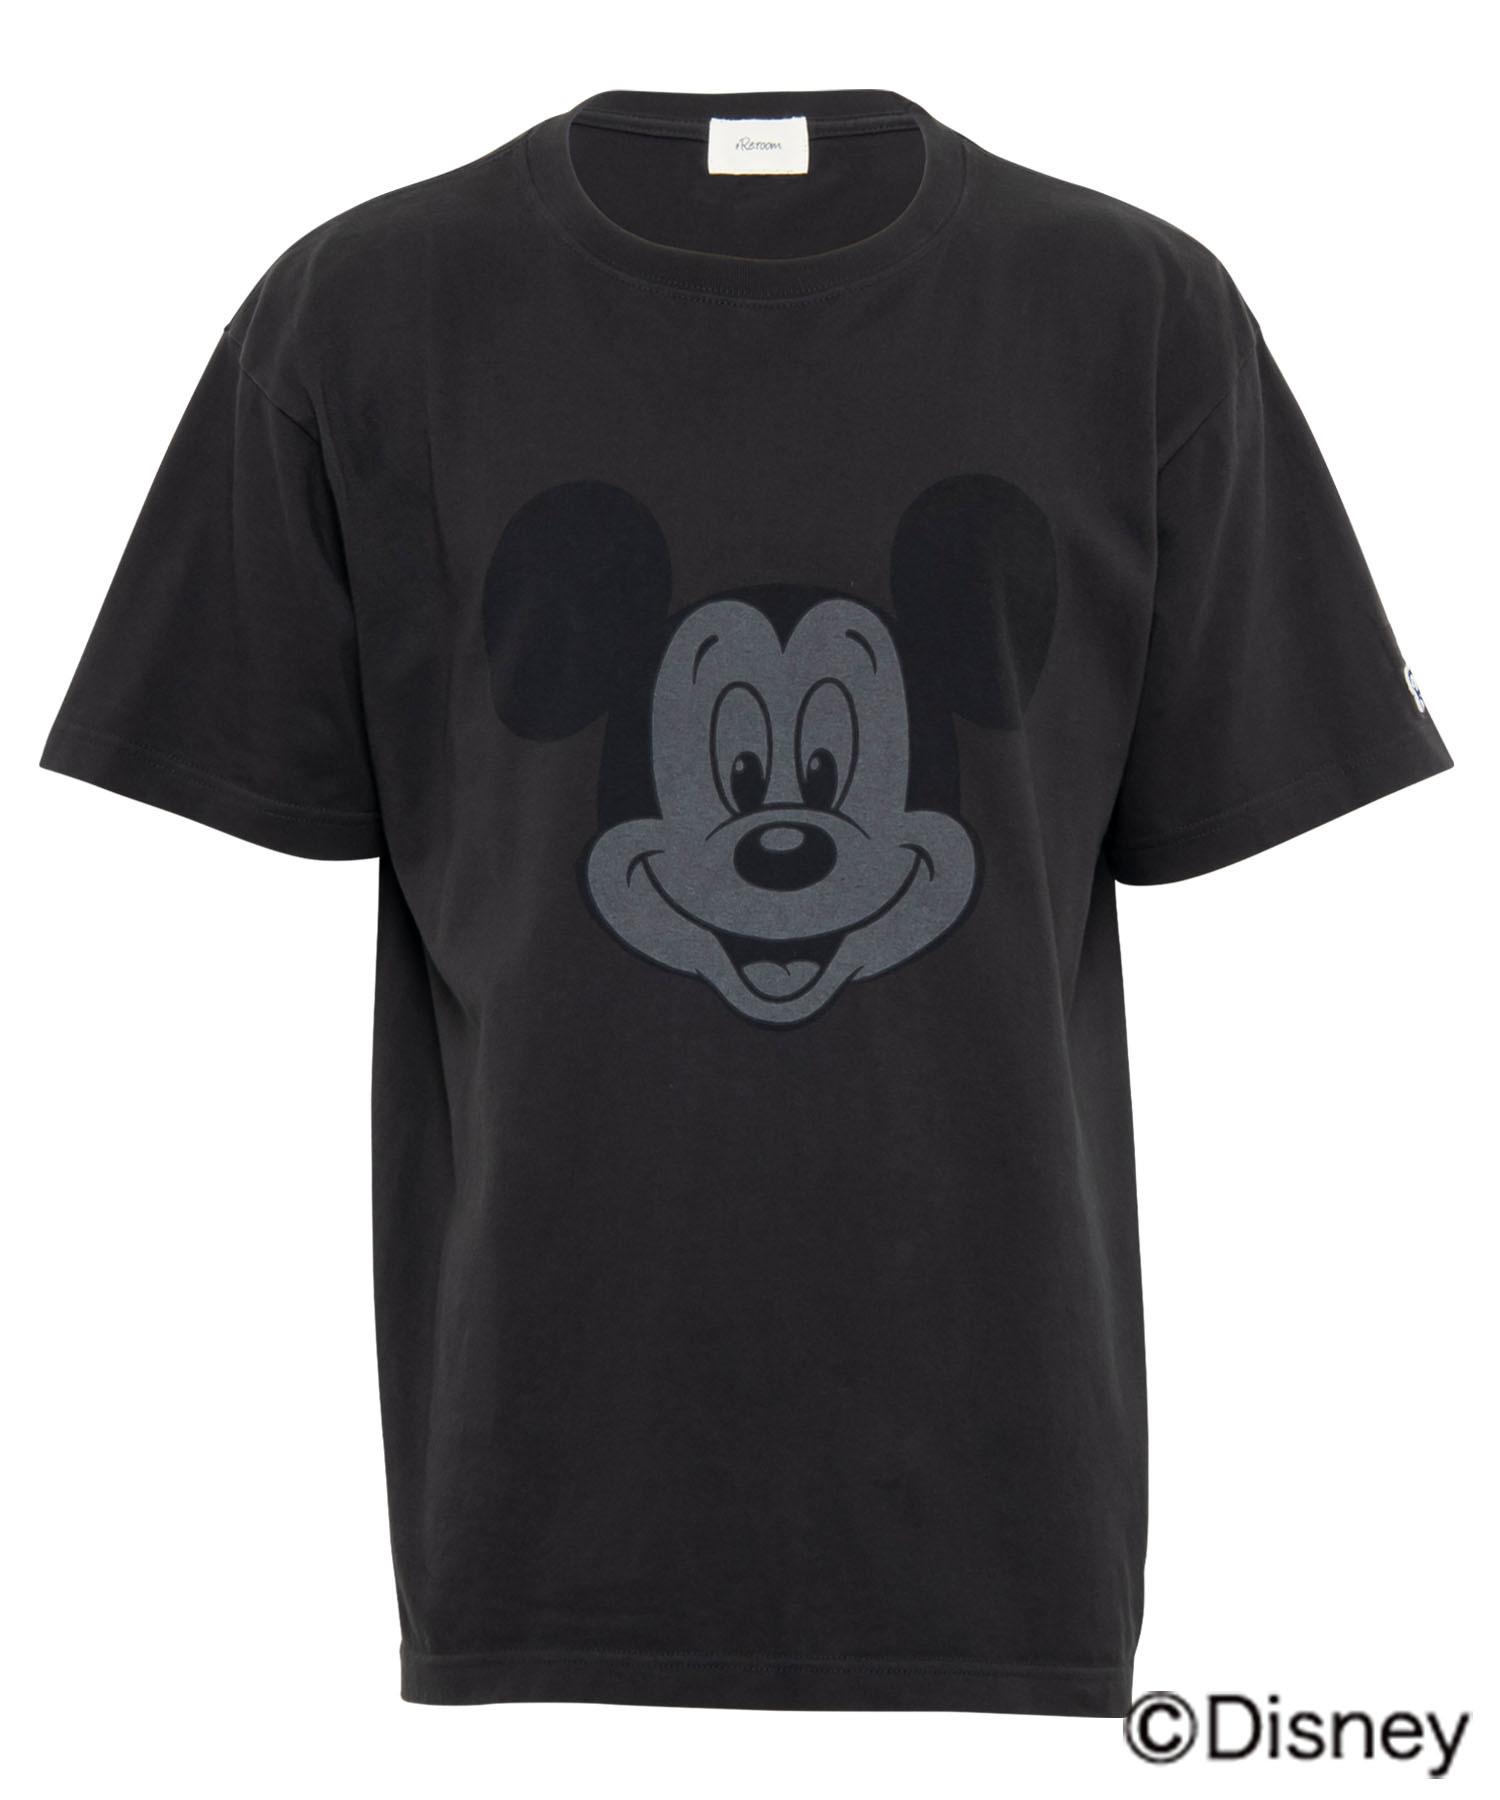 VINTAGE BIG FACE PRINT T-shirt - MICKEY MOUSE[REC409]